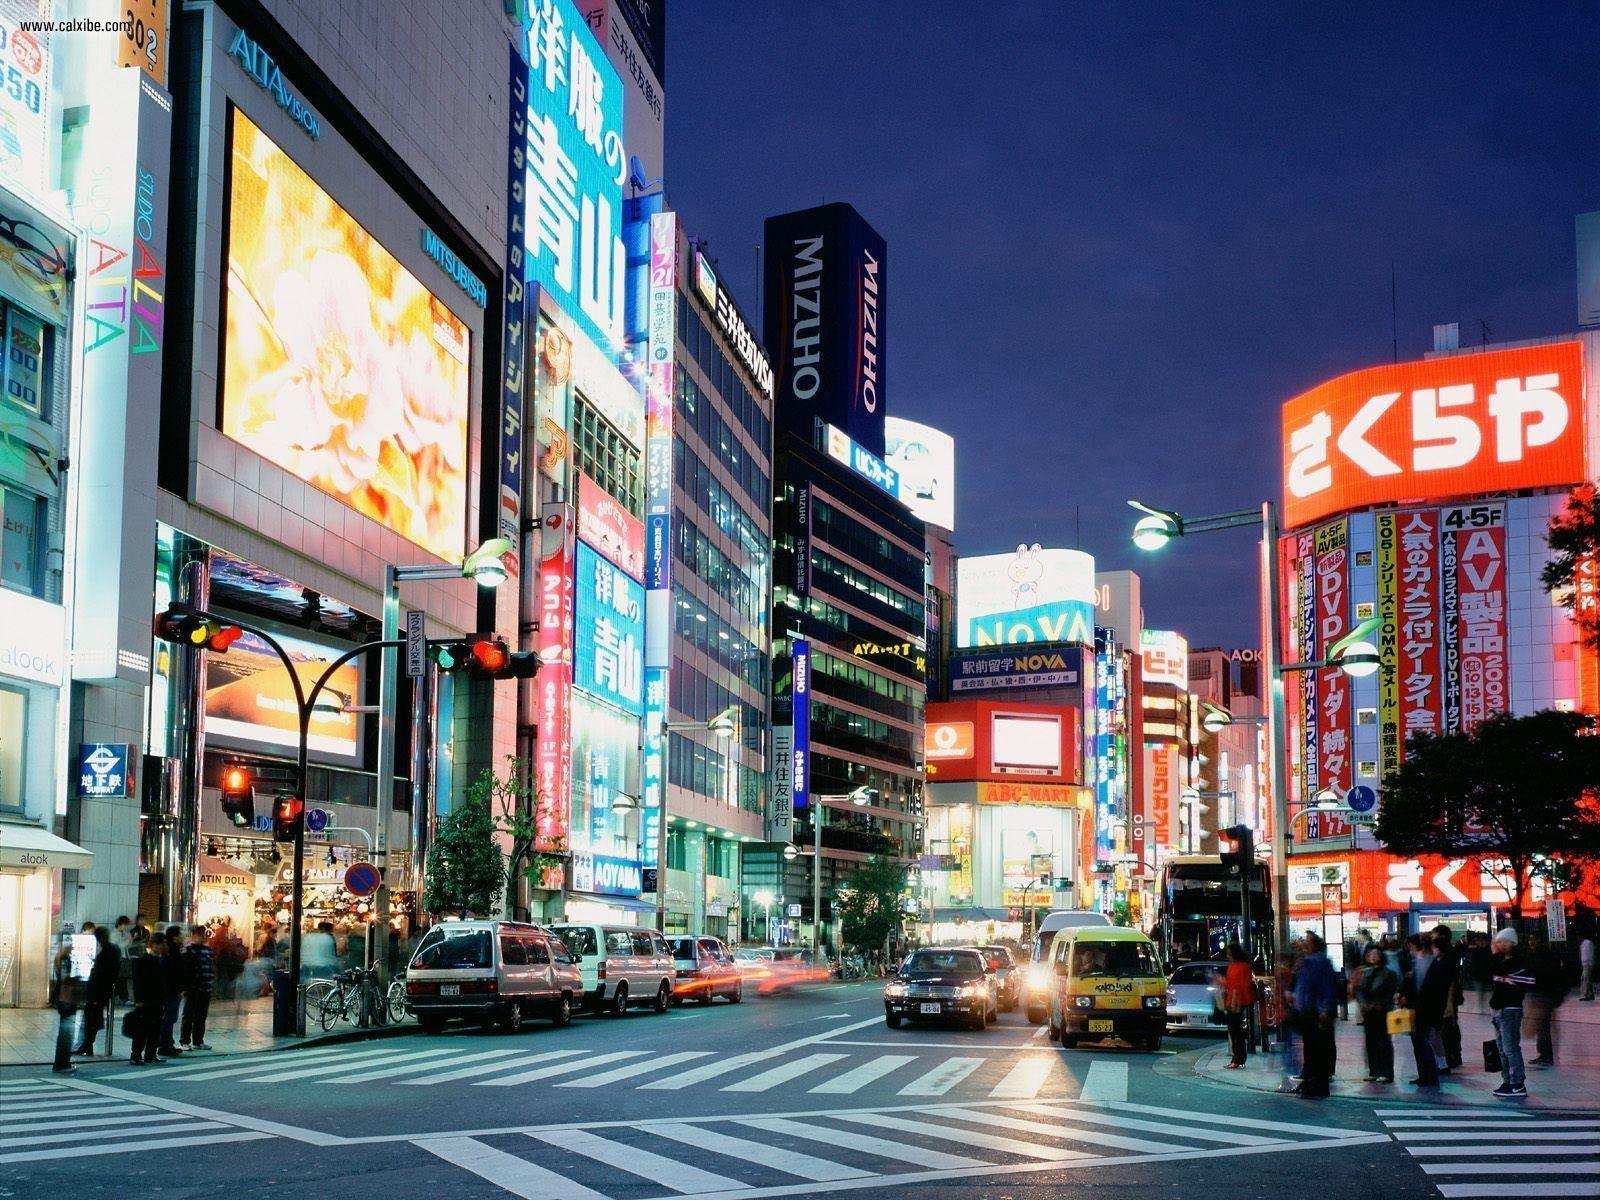 tokyo city wallpapers tokyo city wallpapers tokyo city wallpapers 1600x1200